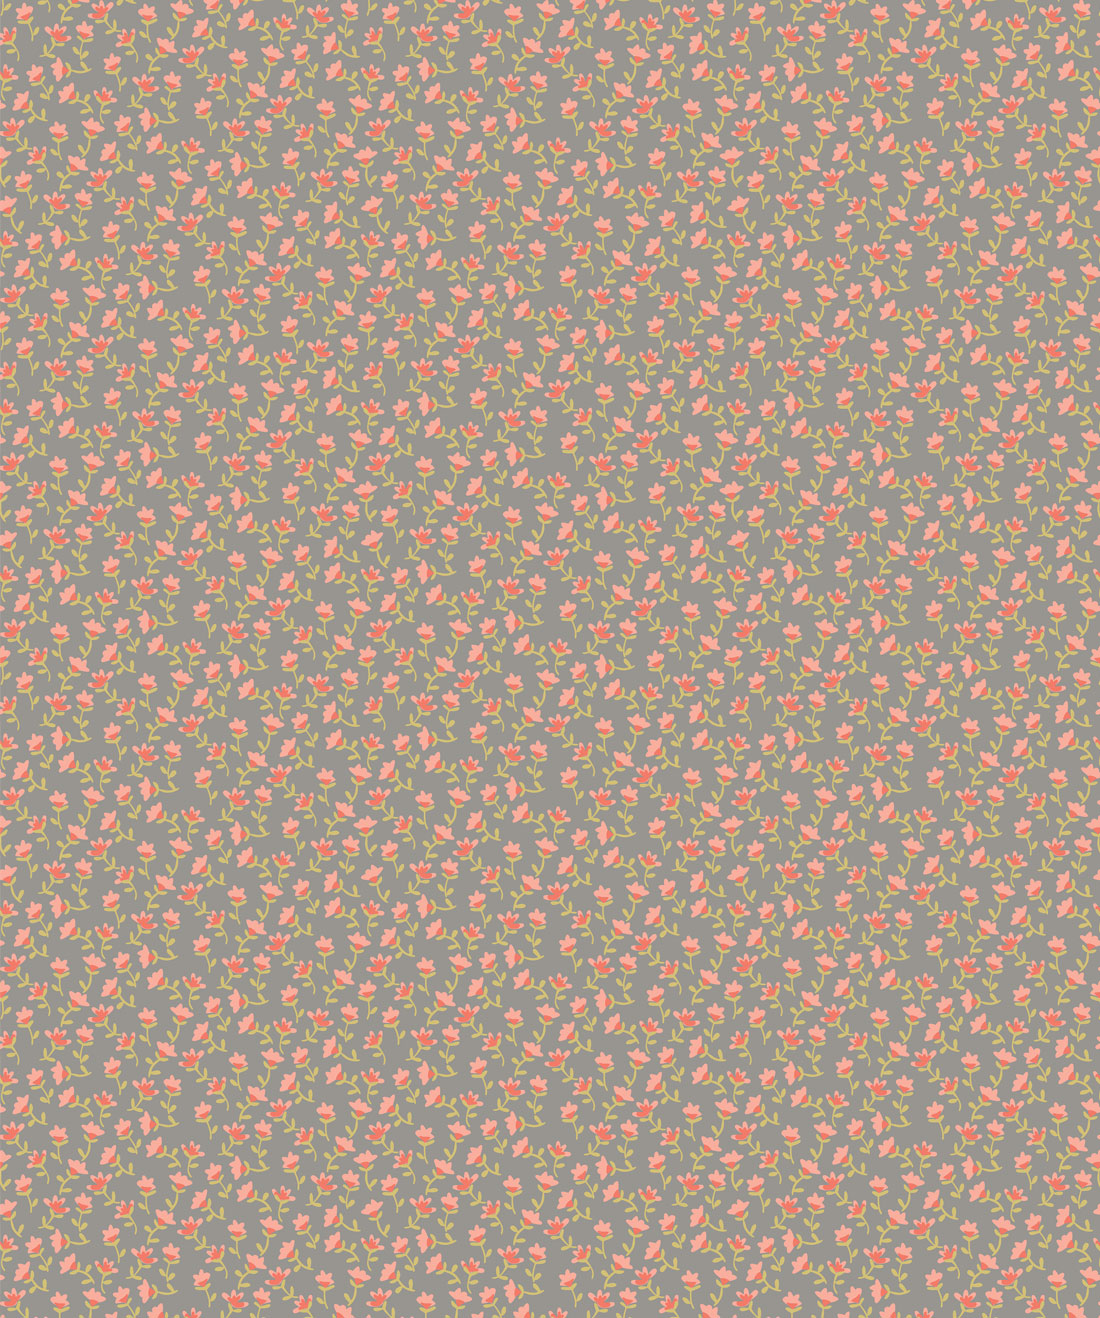 Tiny Flowers Wallpaper